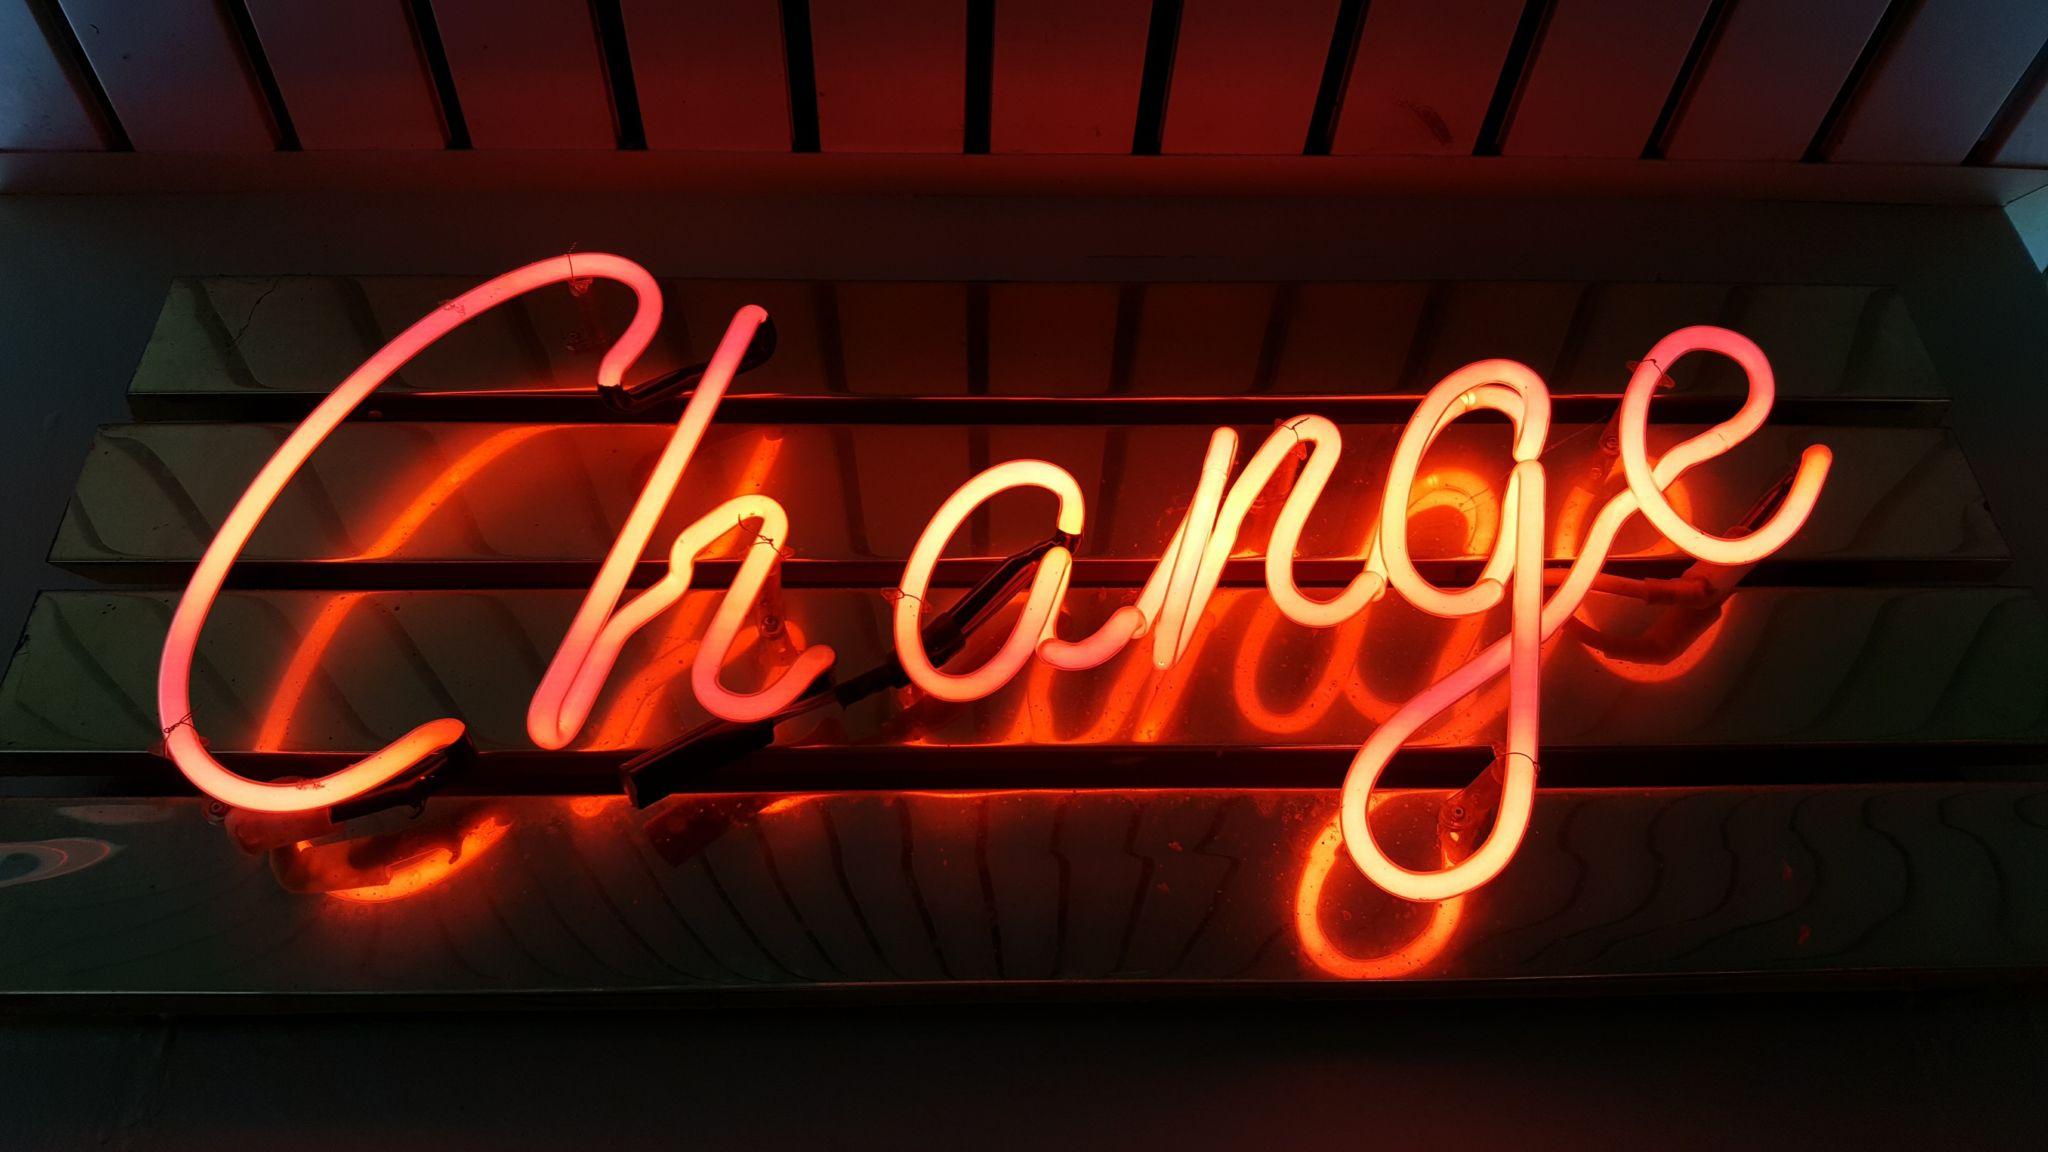 Change Photo by Ross Findon on Unsplash